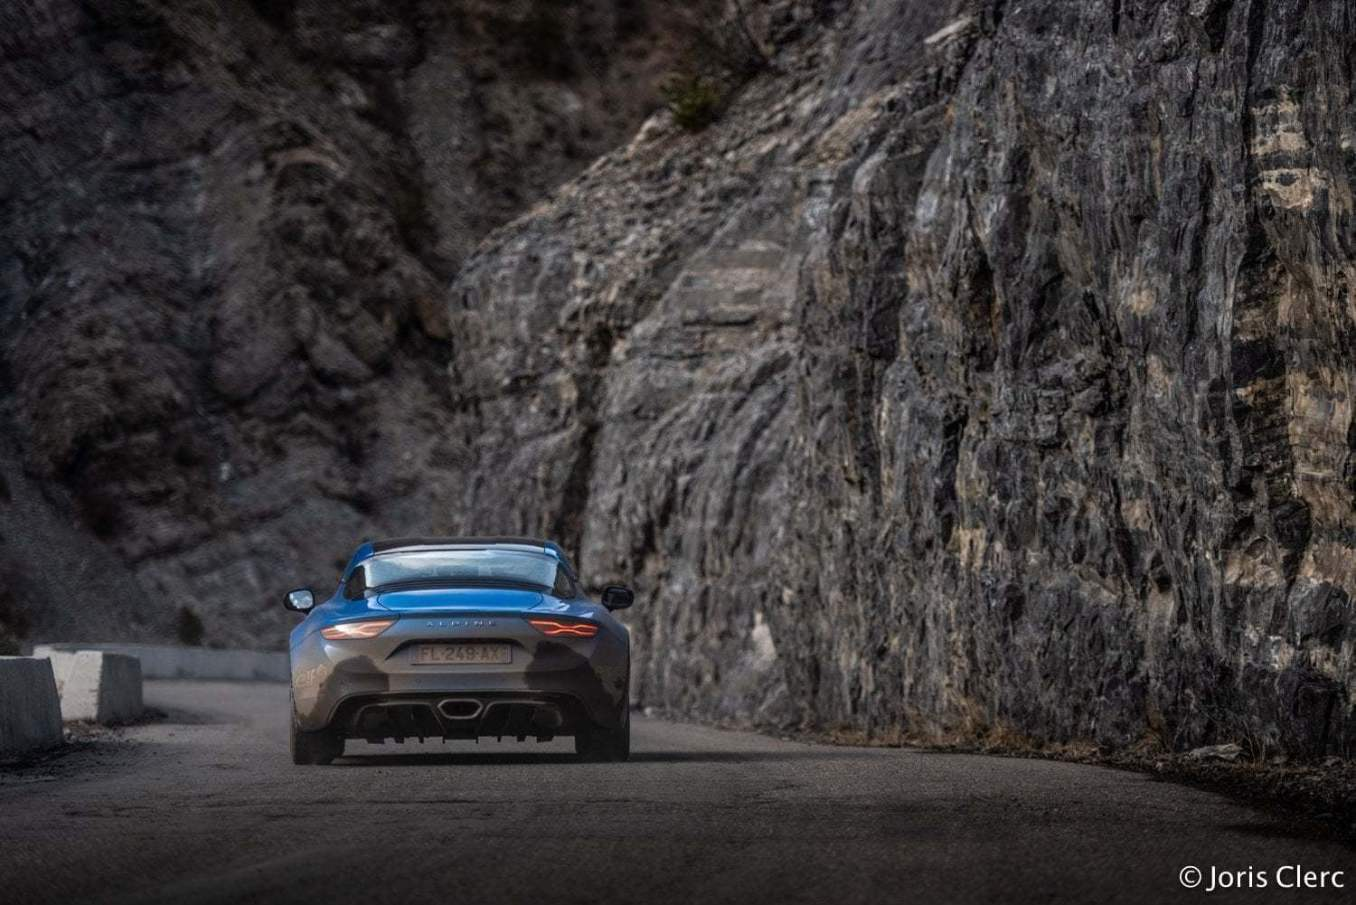 alpine a110 ouvreuse rallye monte carlo 2 | Une Alpine A110 ouvreuse au Rallye Monte-Carlo